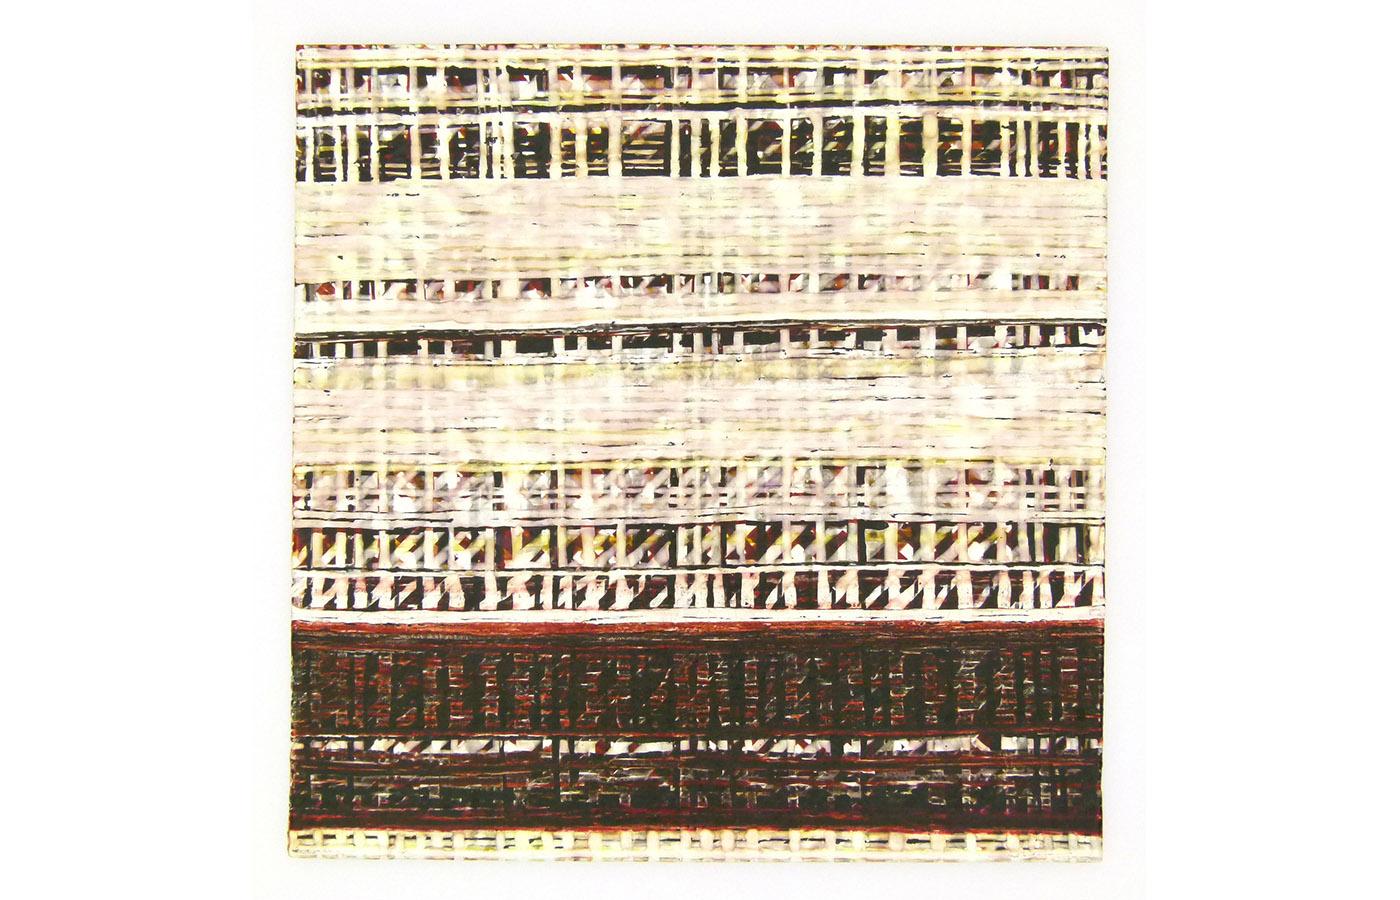 Linienbilder 3_0002_L1150008a